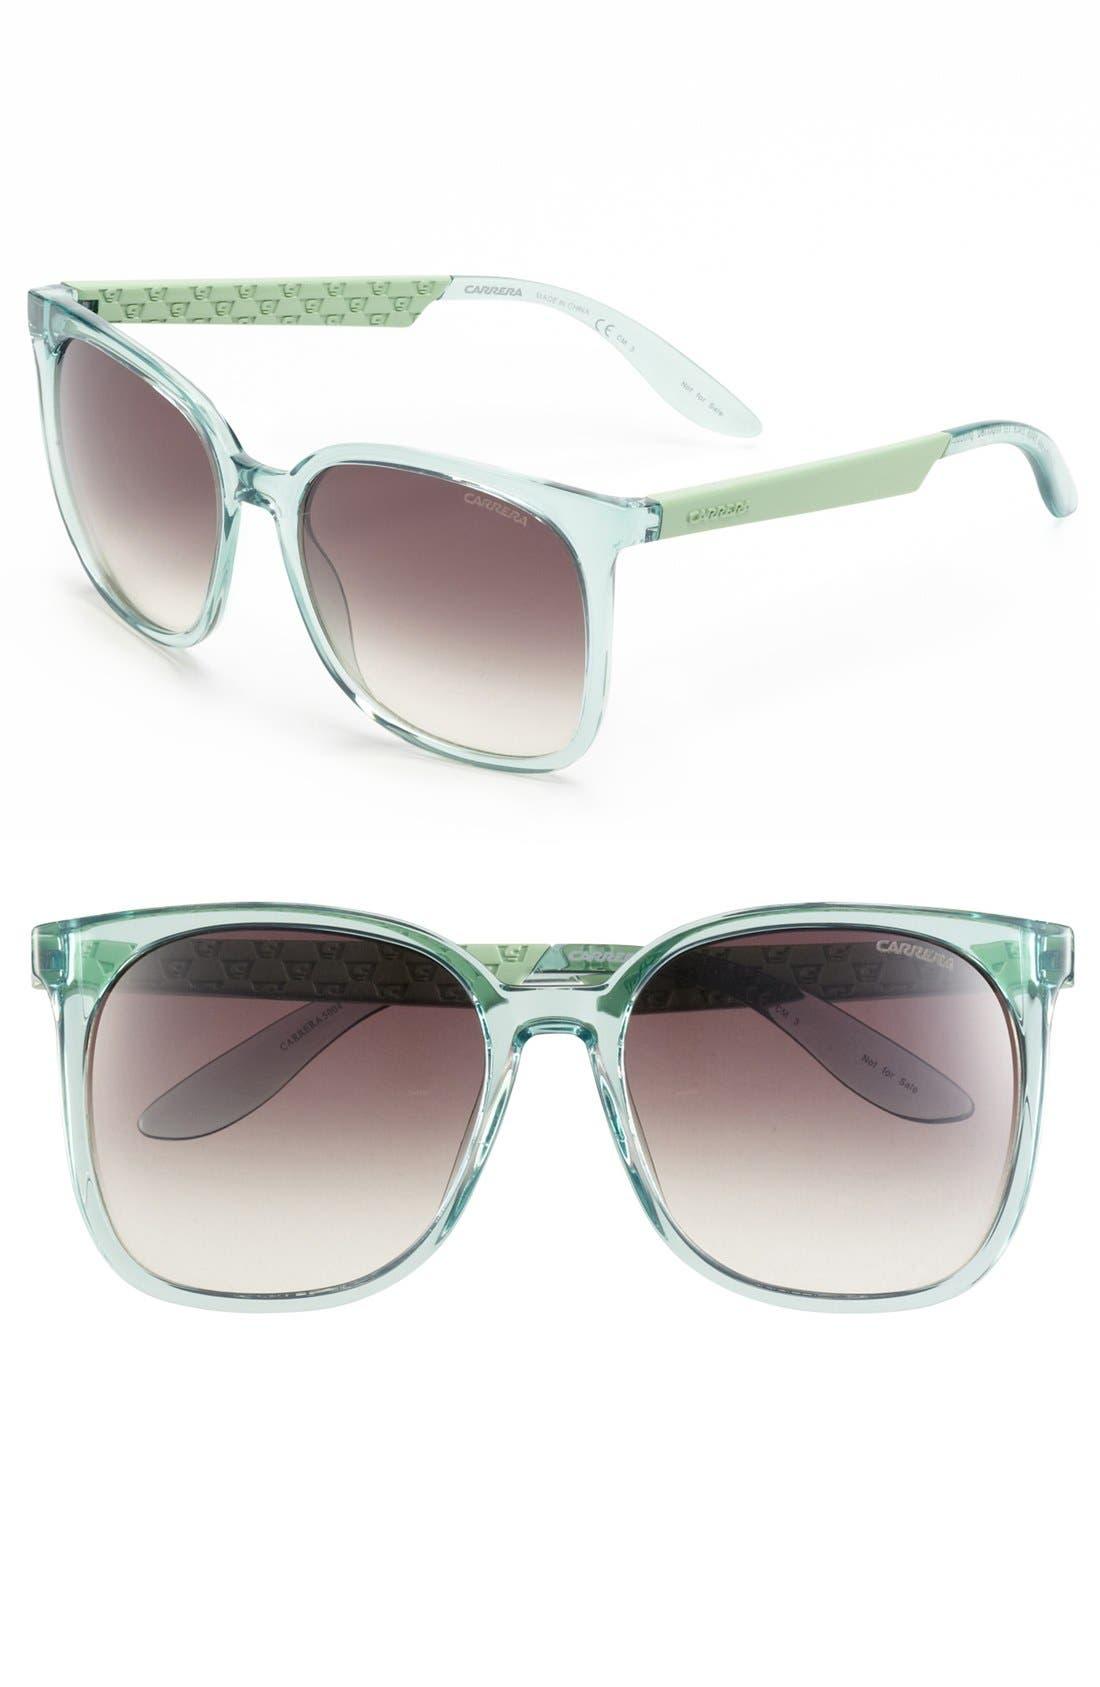 Main Image - Carrera Eyewear 57mm Sunglasses